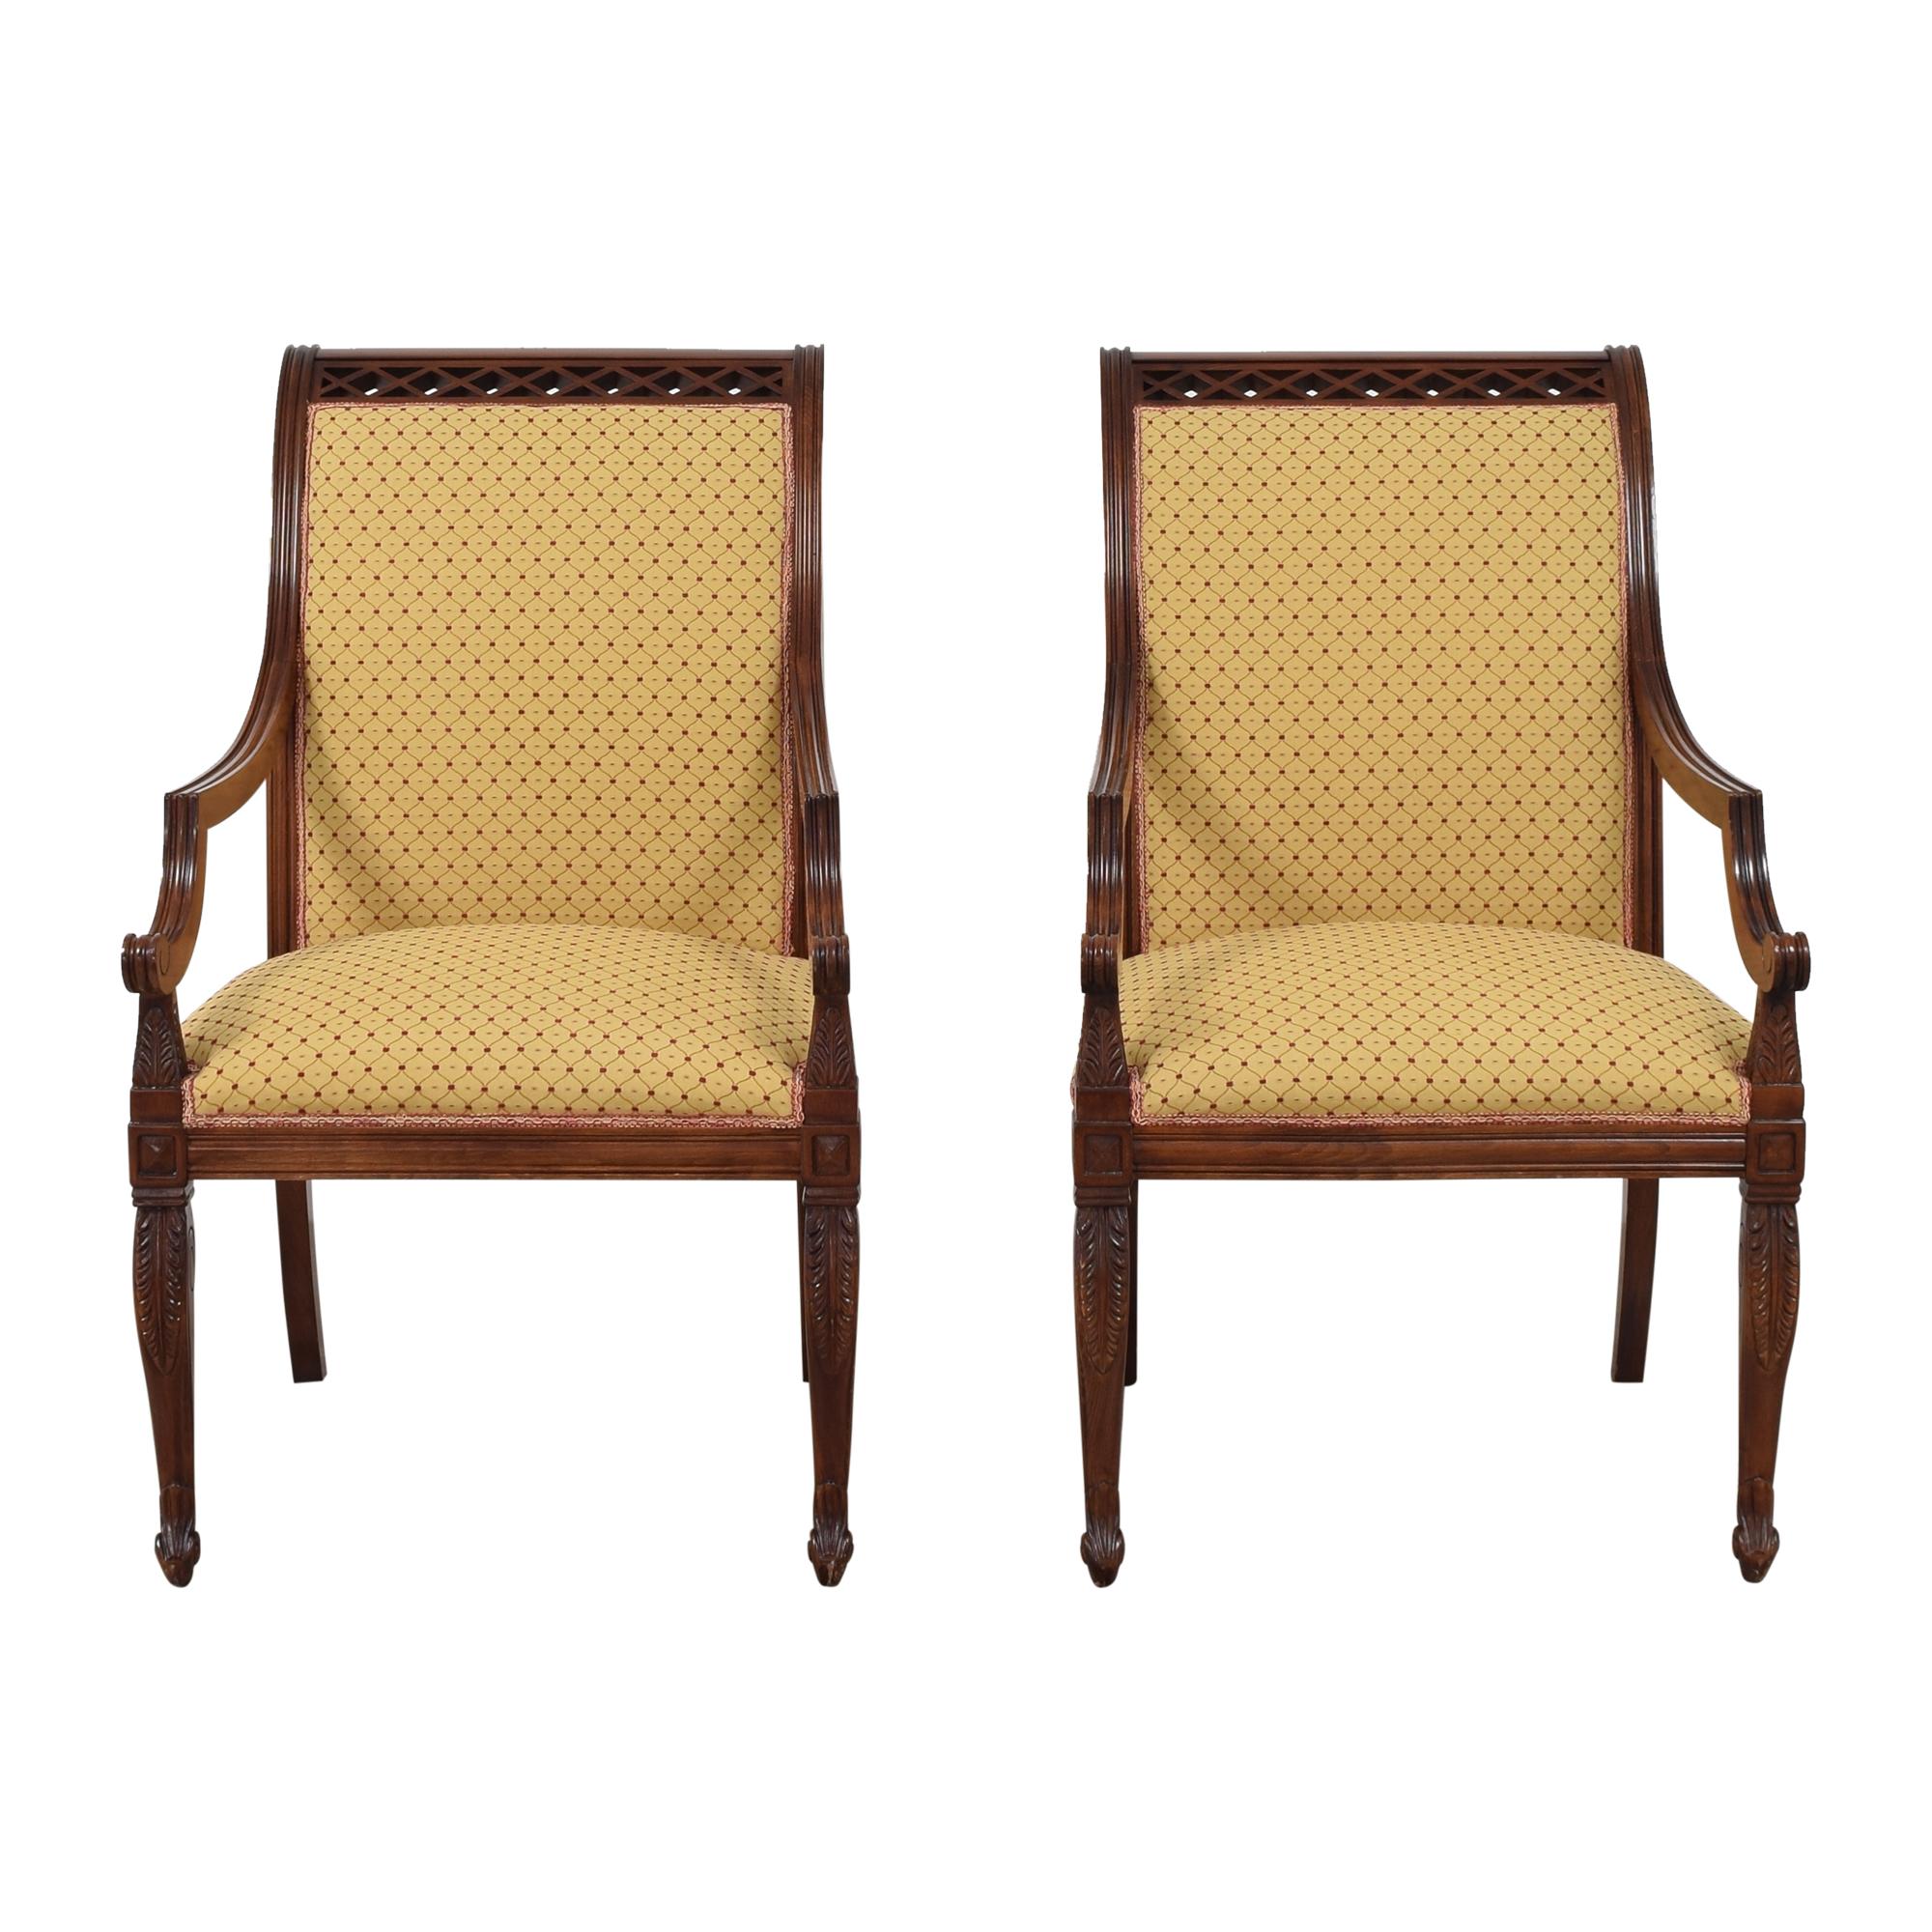 KPS Furnishings KPS Furnishings Custom Dining Arm Chairs for sale